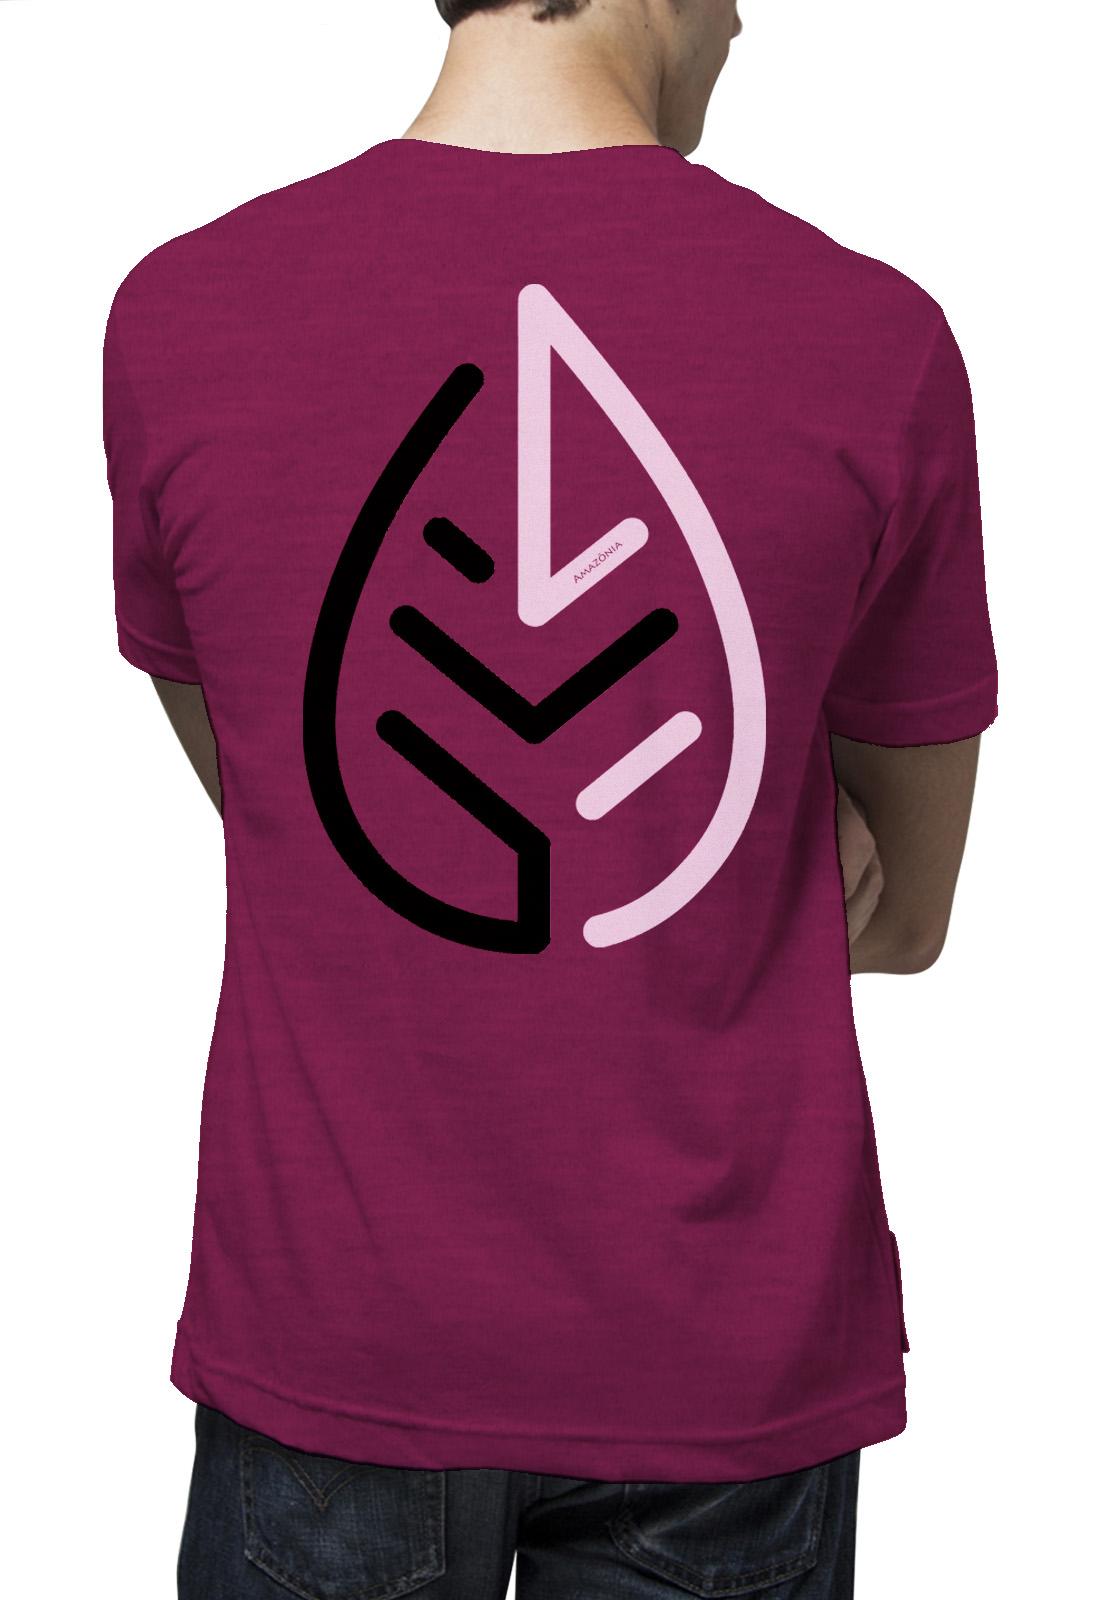 Camiseta Amazônia Bicolor Folha - Mescla Vinho